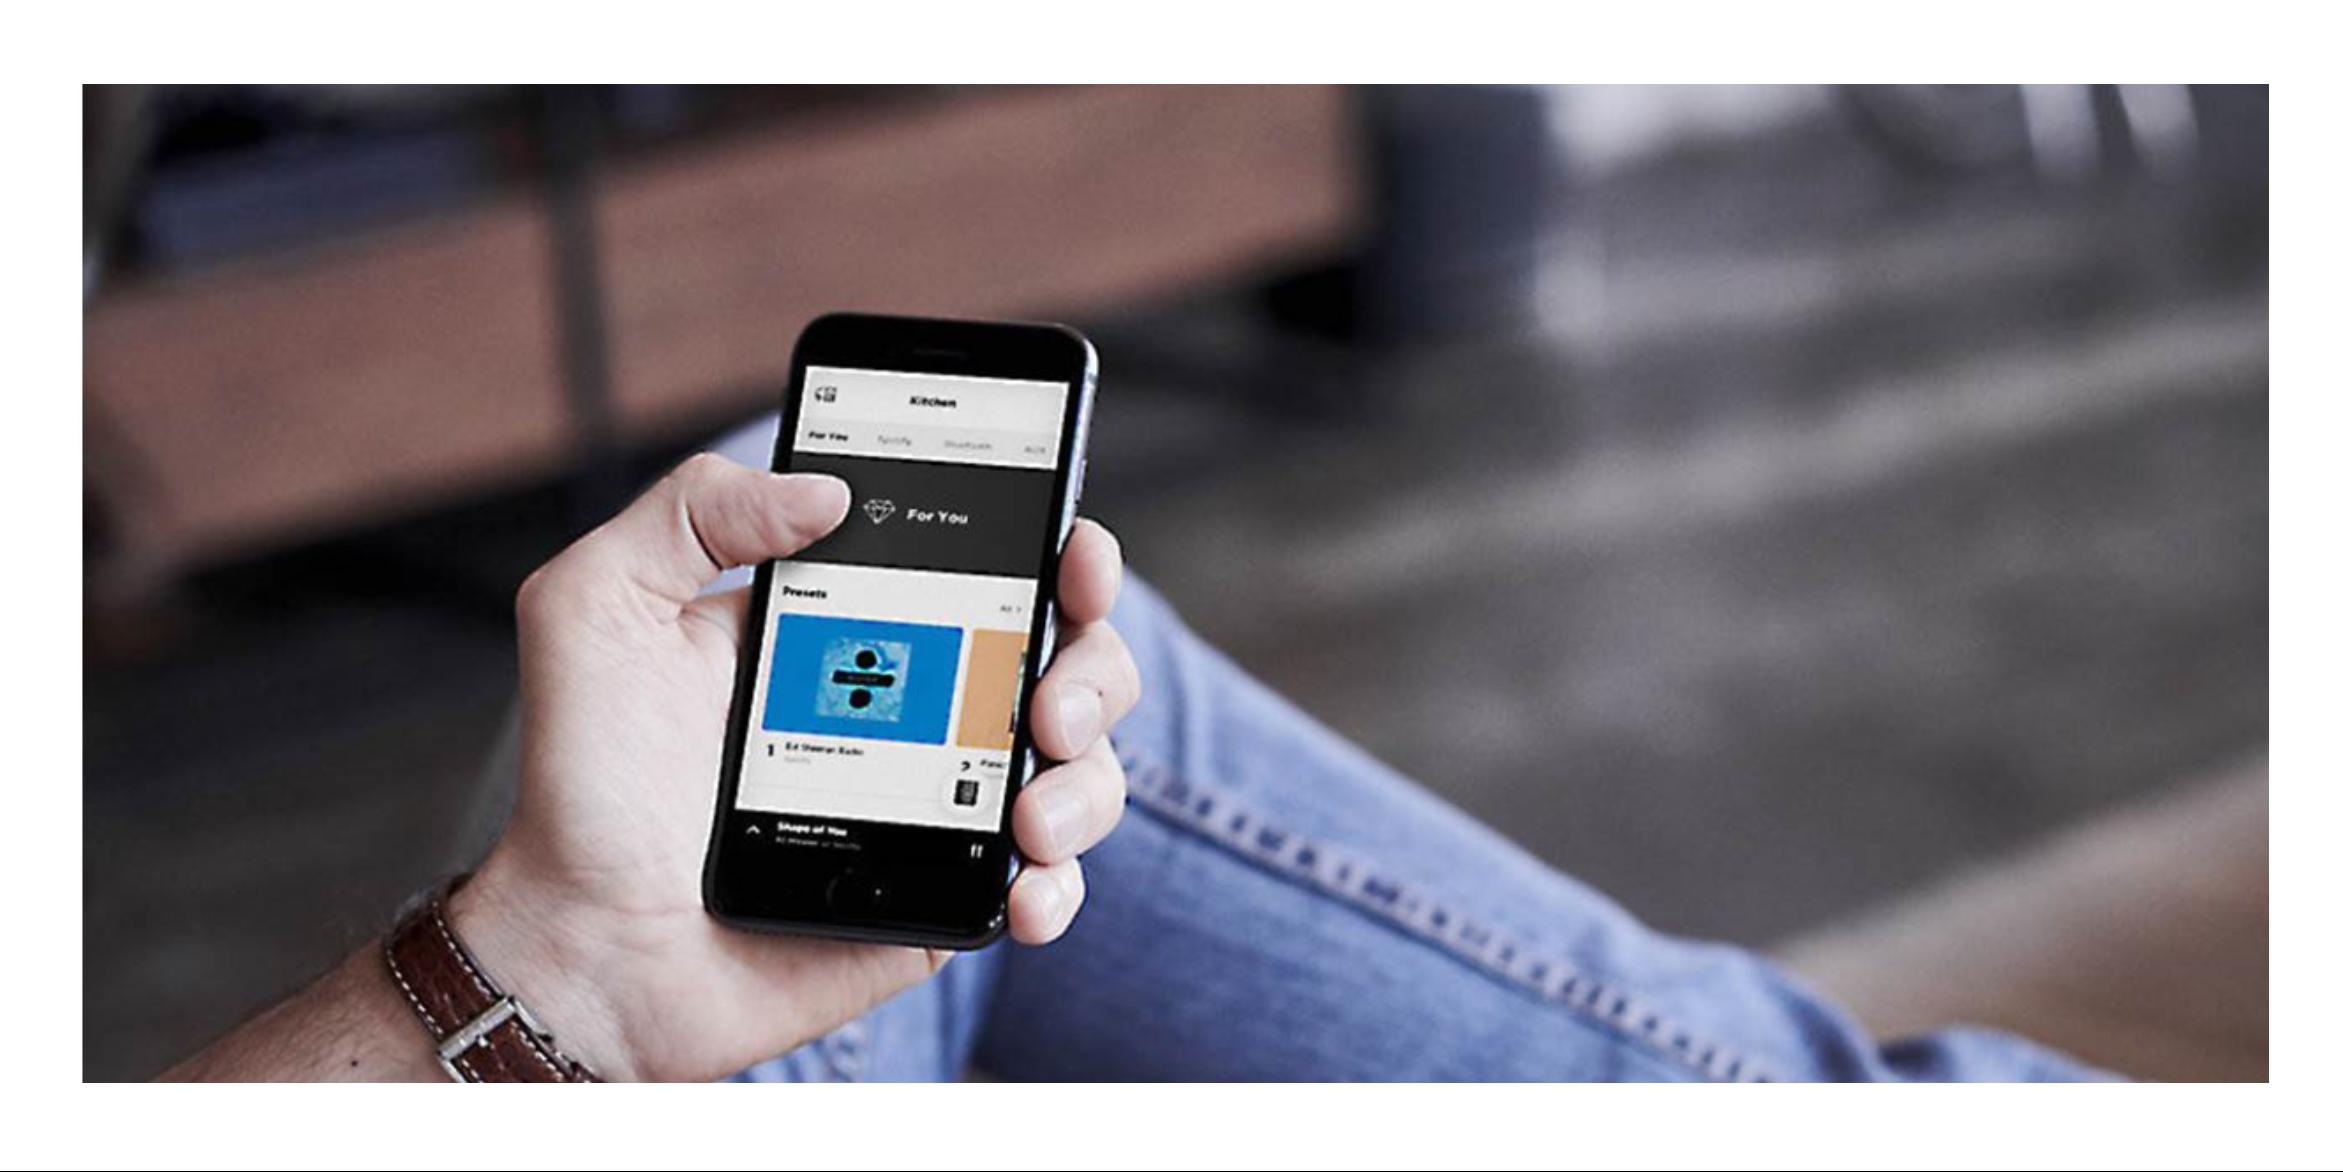 Bose Soundbar 700 Alexa Enabled Smart Soundbar Application